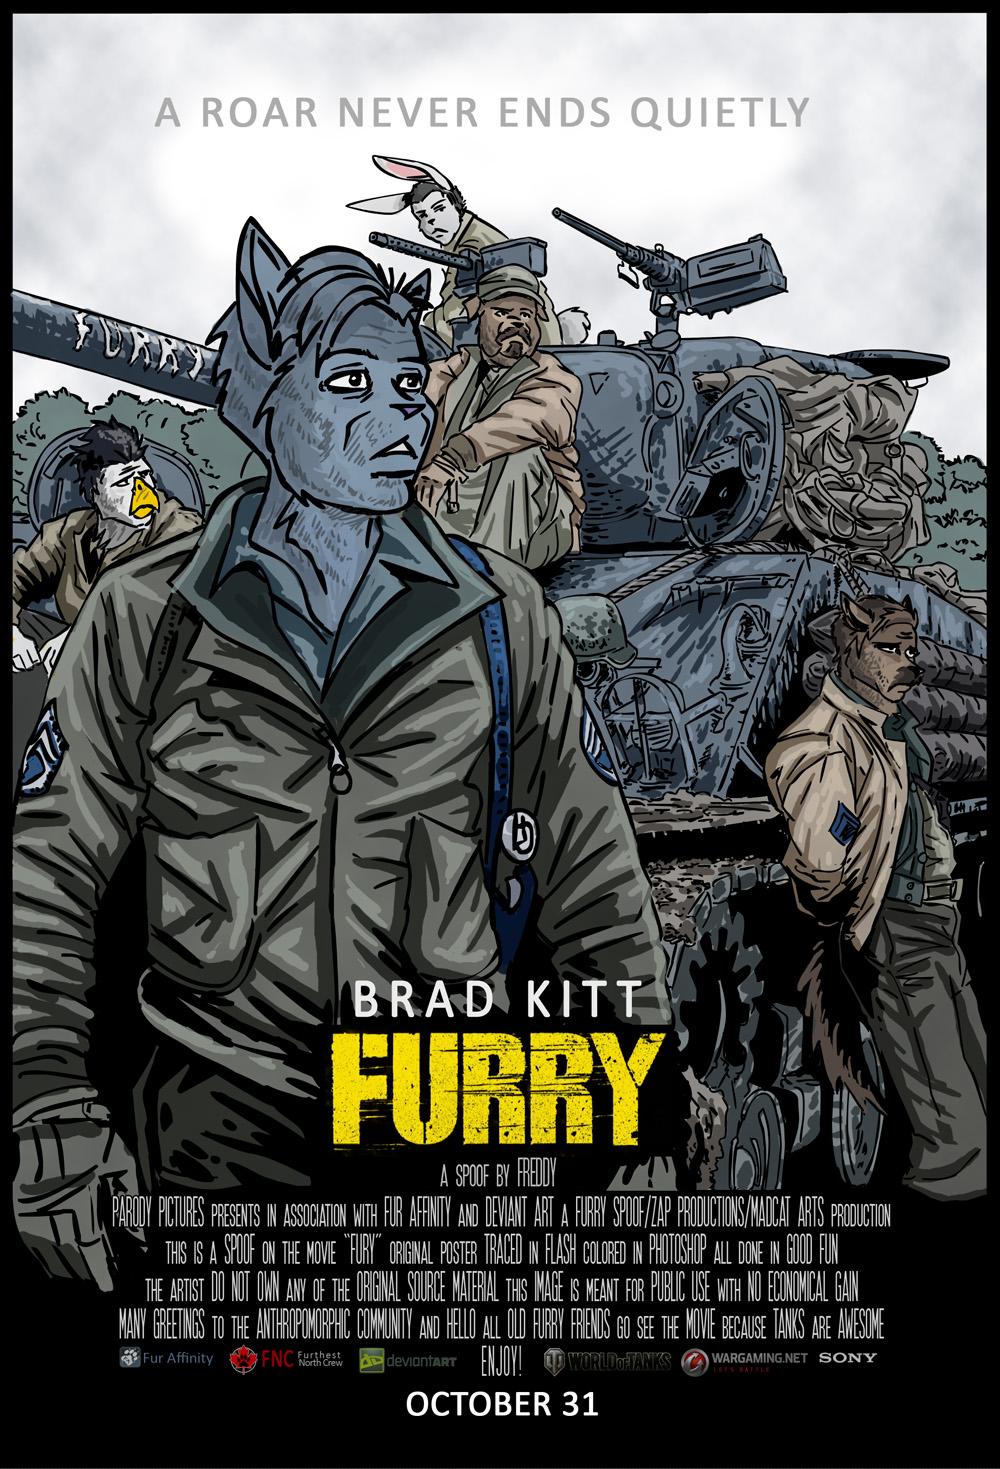 Furry spoof movie poster DerangedMeowMeow 2014 by ...